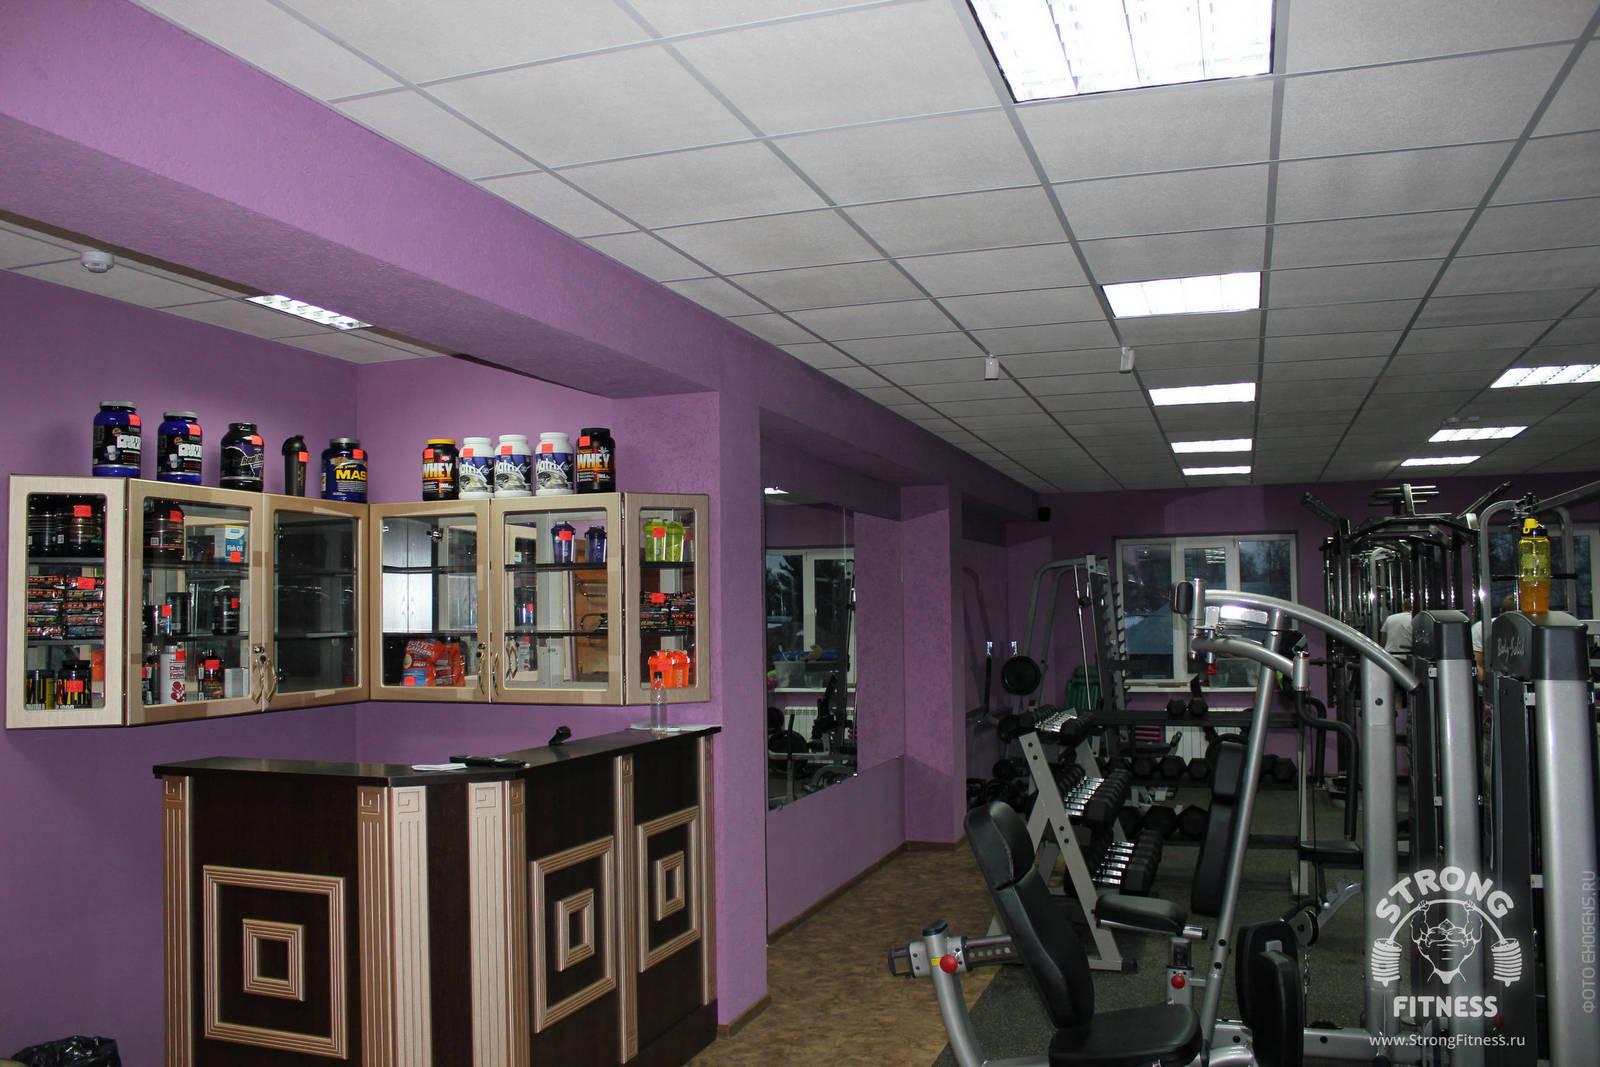 Фотографии ресепшена тренажерного зала